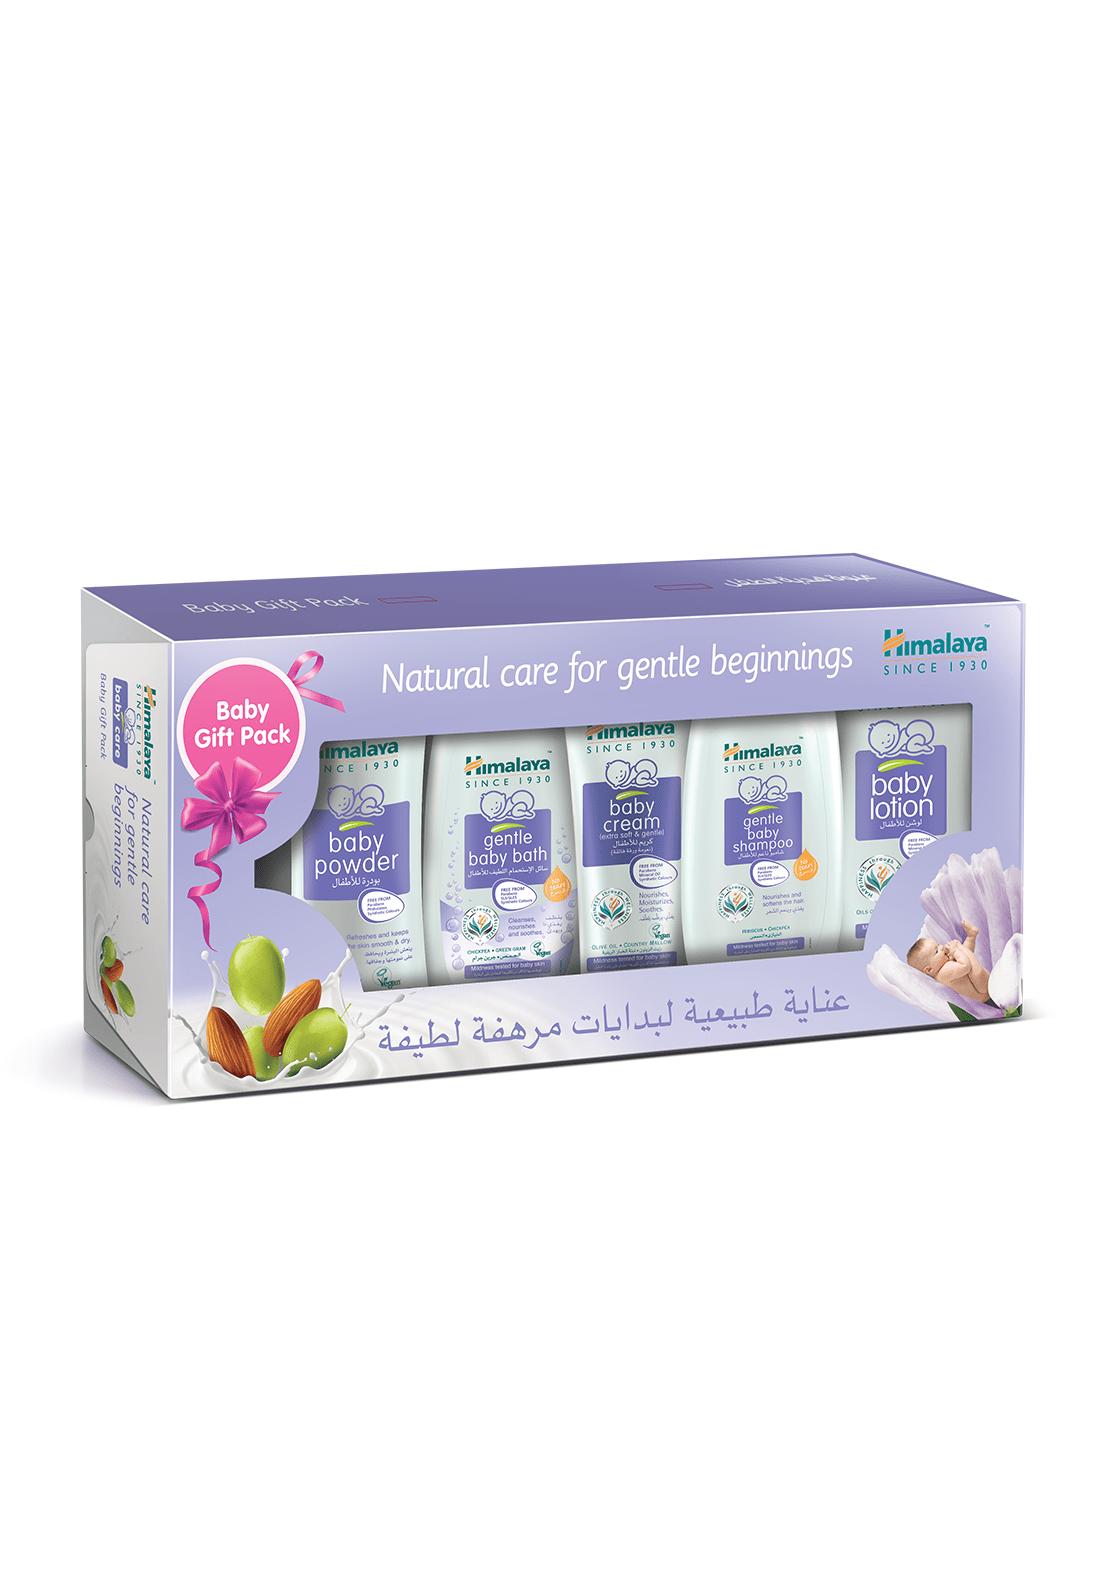 Baby Gift pack ( 5 Items ) - هيمالايا هدية الطفل ( 5 منتجات )